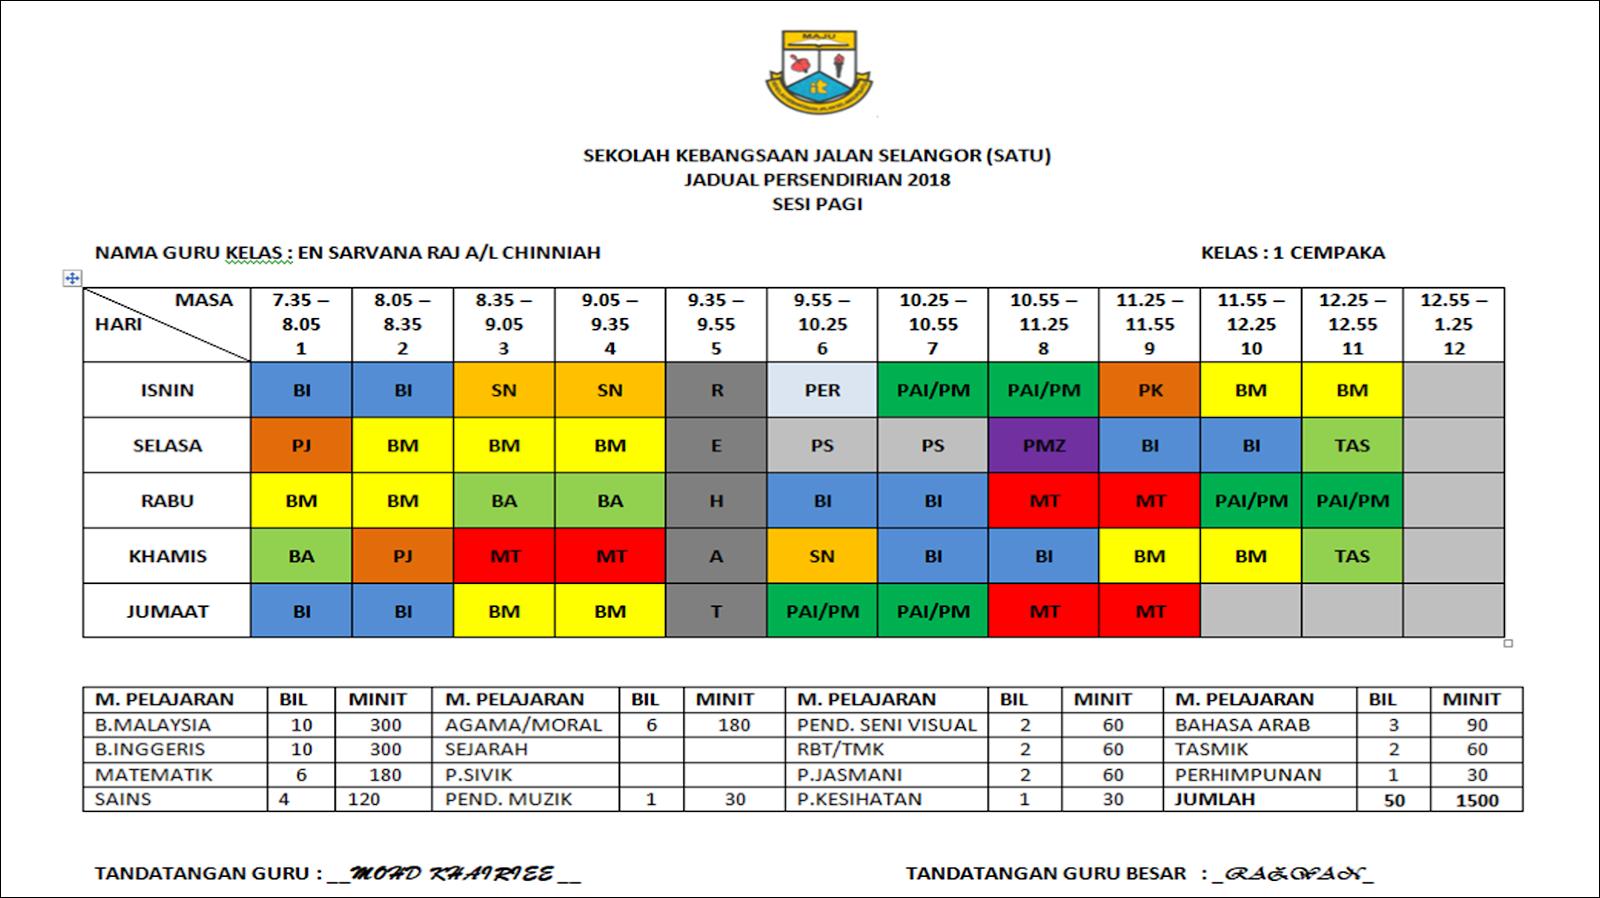 Perubahan Jadual Waktu Kelas 2018 Sk Jalan Selangor Satu